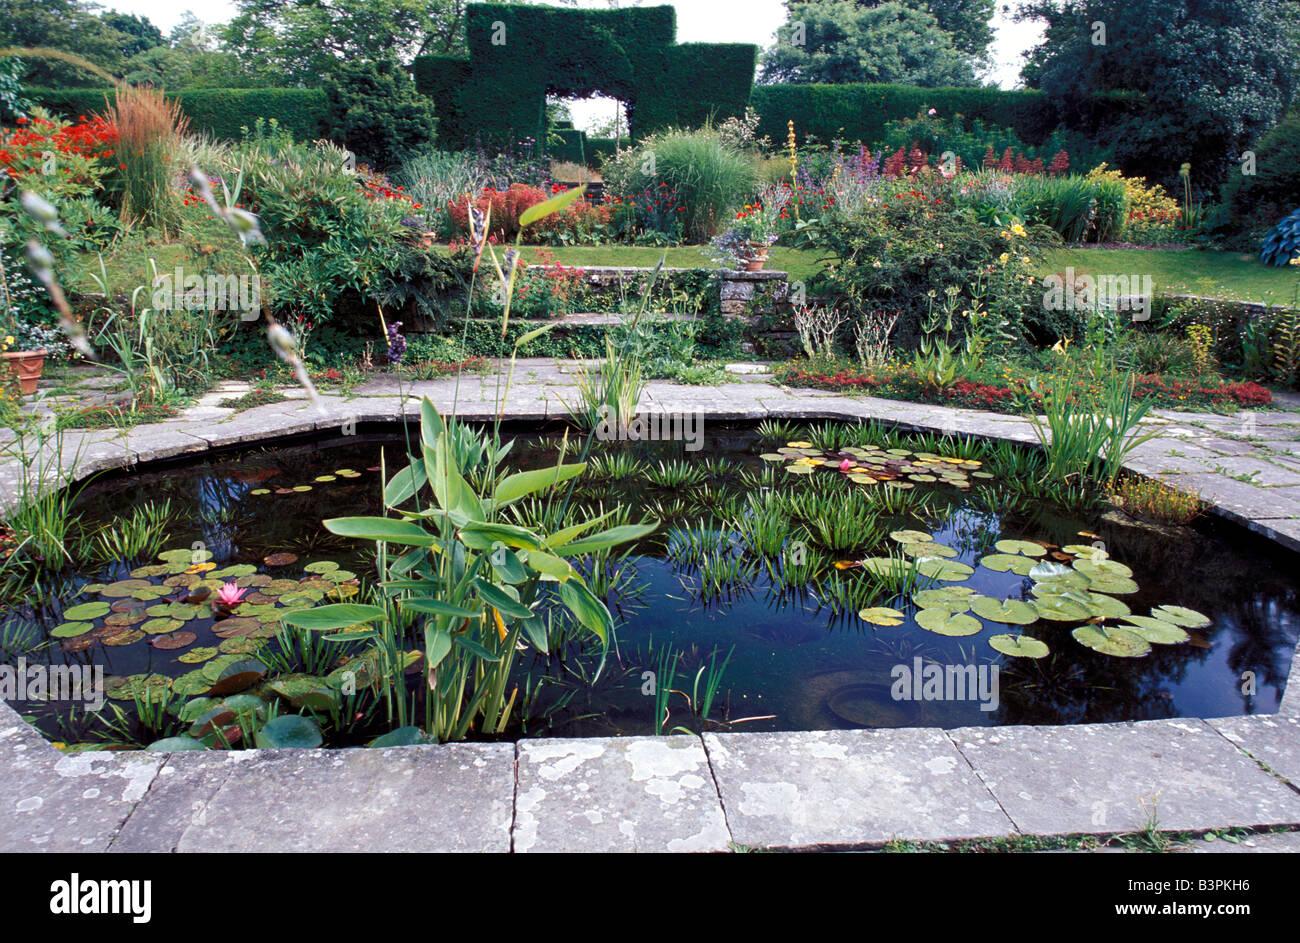 Sunk Garden, Great Dixter Gardens, Northiam, Rye, East Sussex, England, United Kingdom, Europe - Stock Image